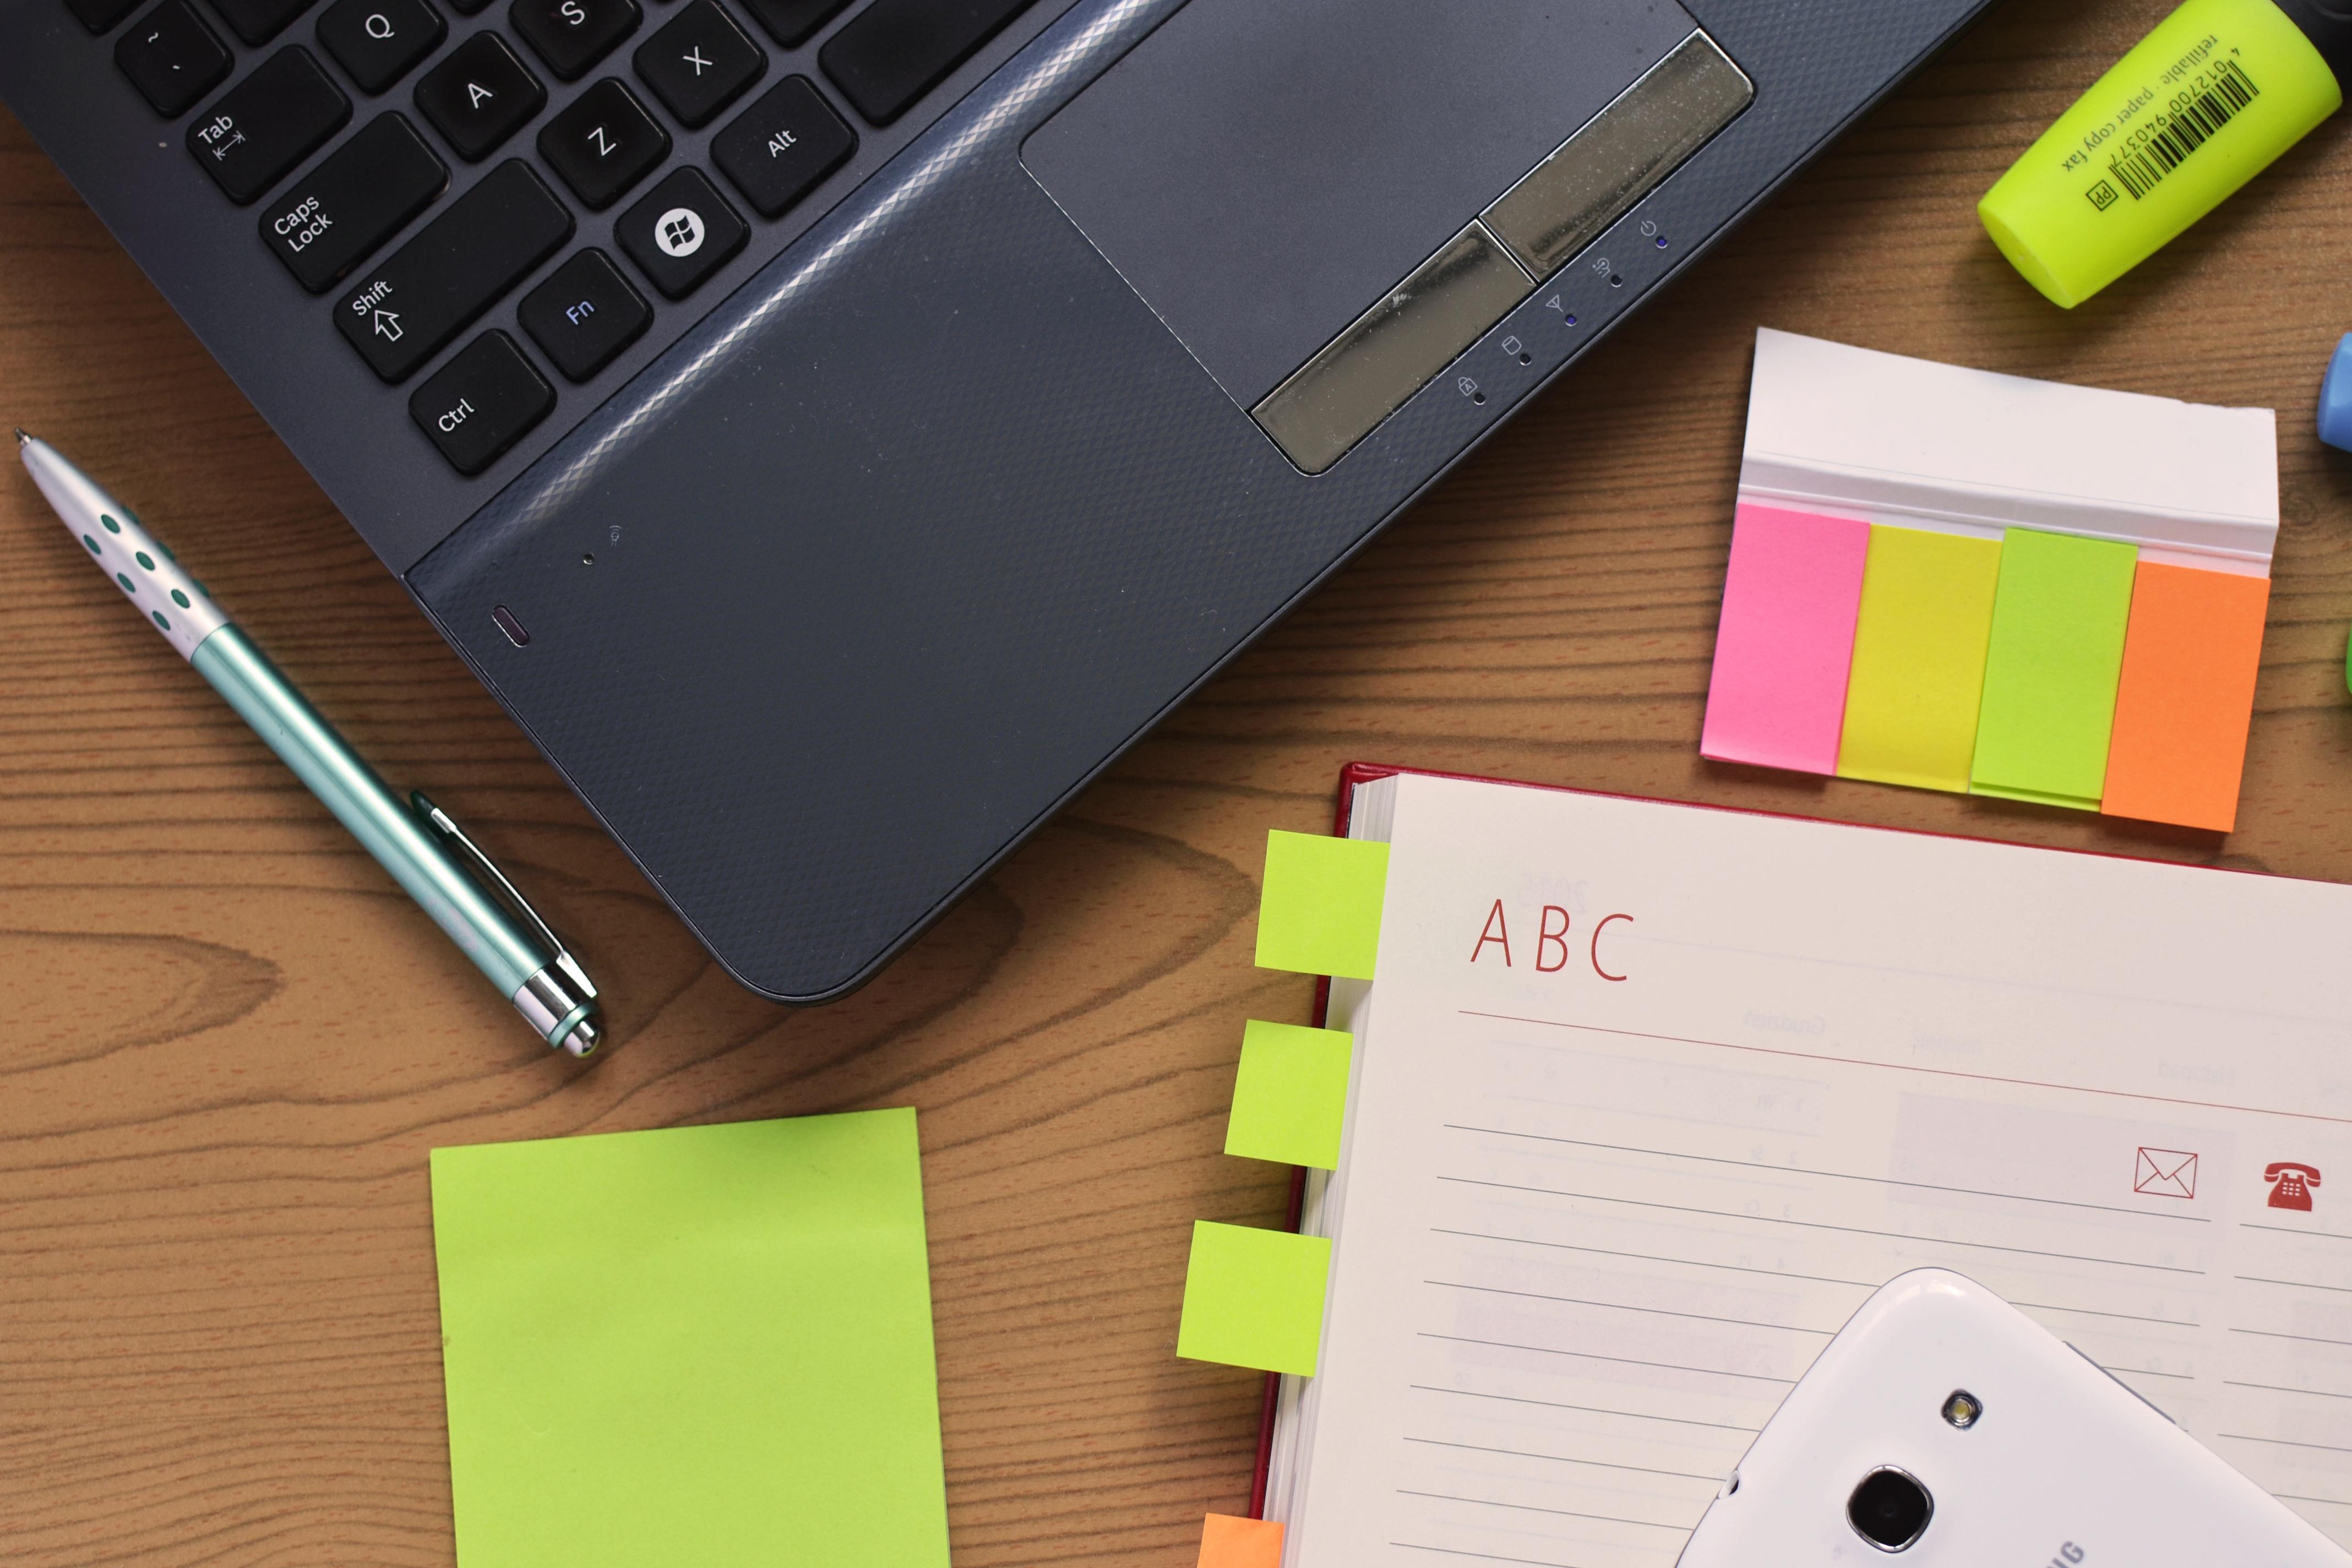 desk-laptop-notebook-pen.jpg